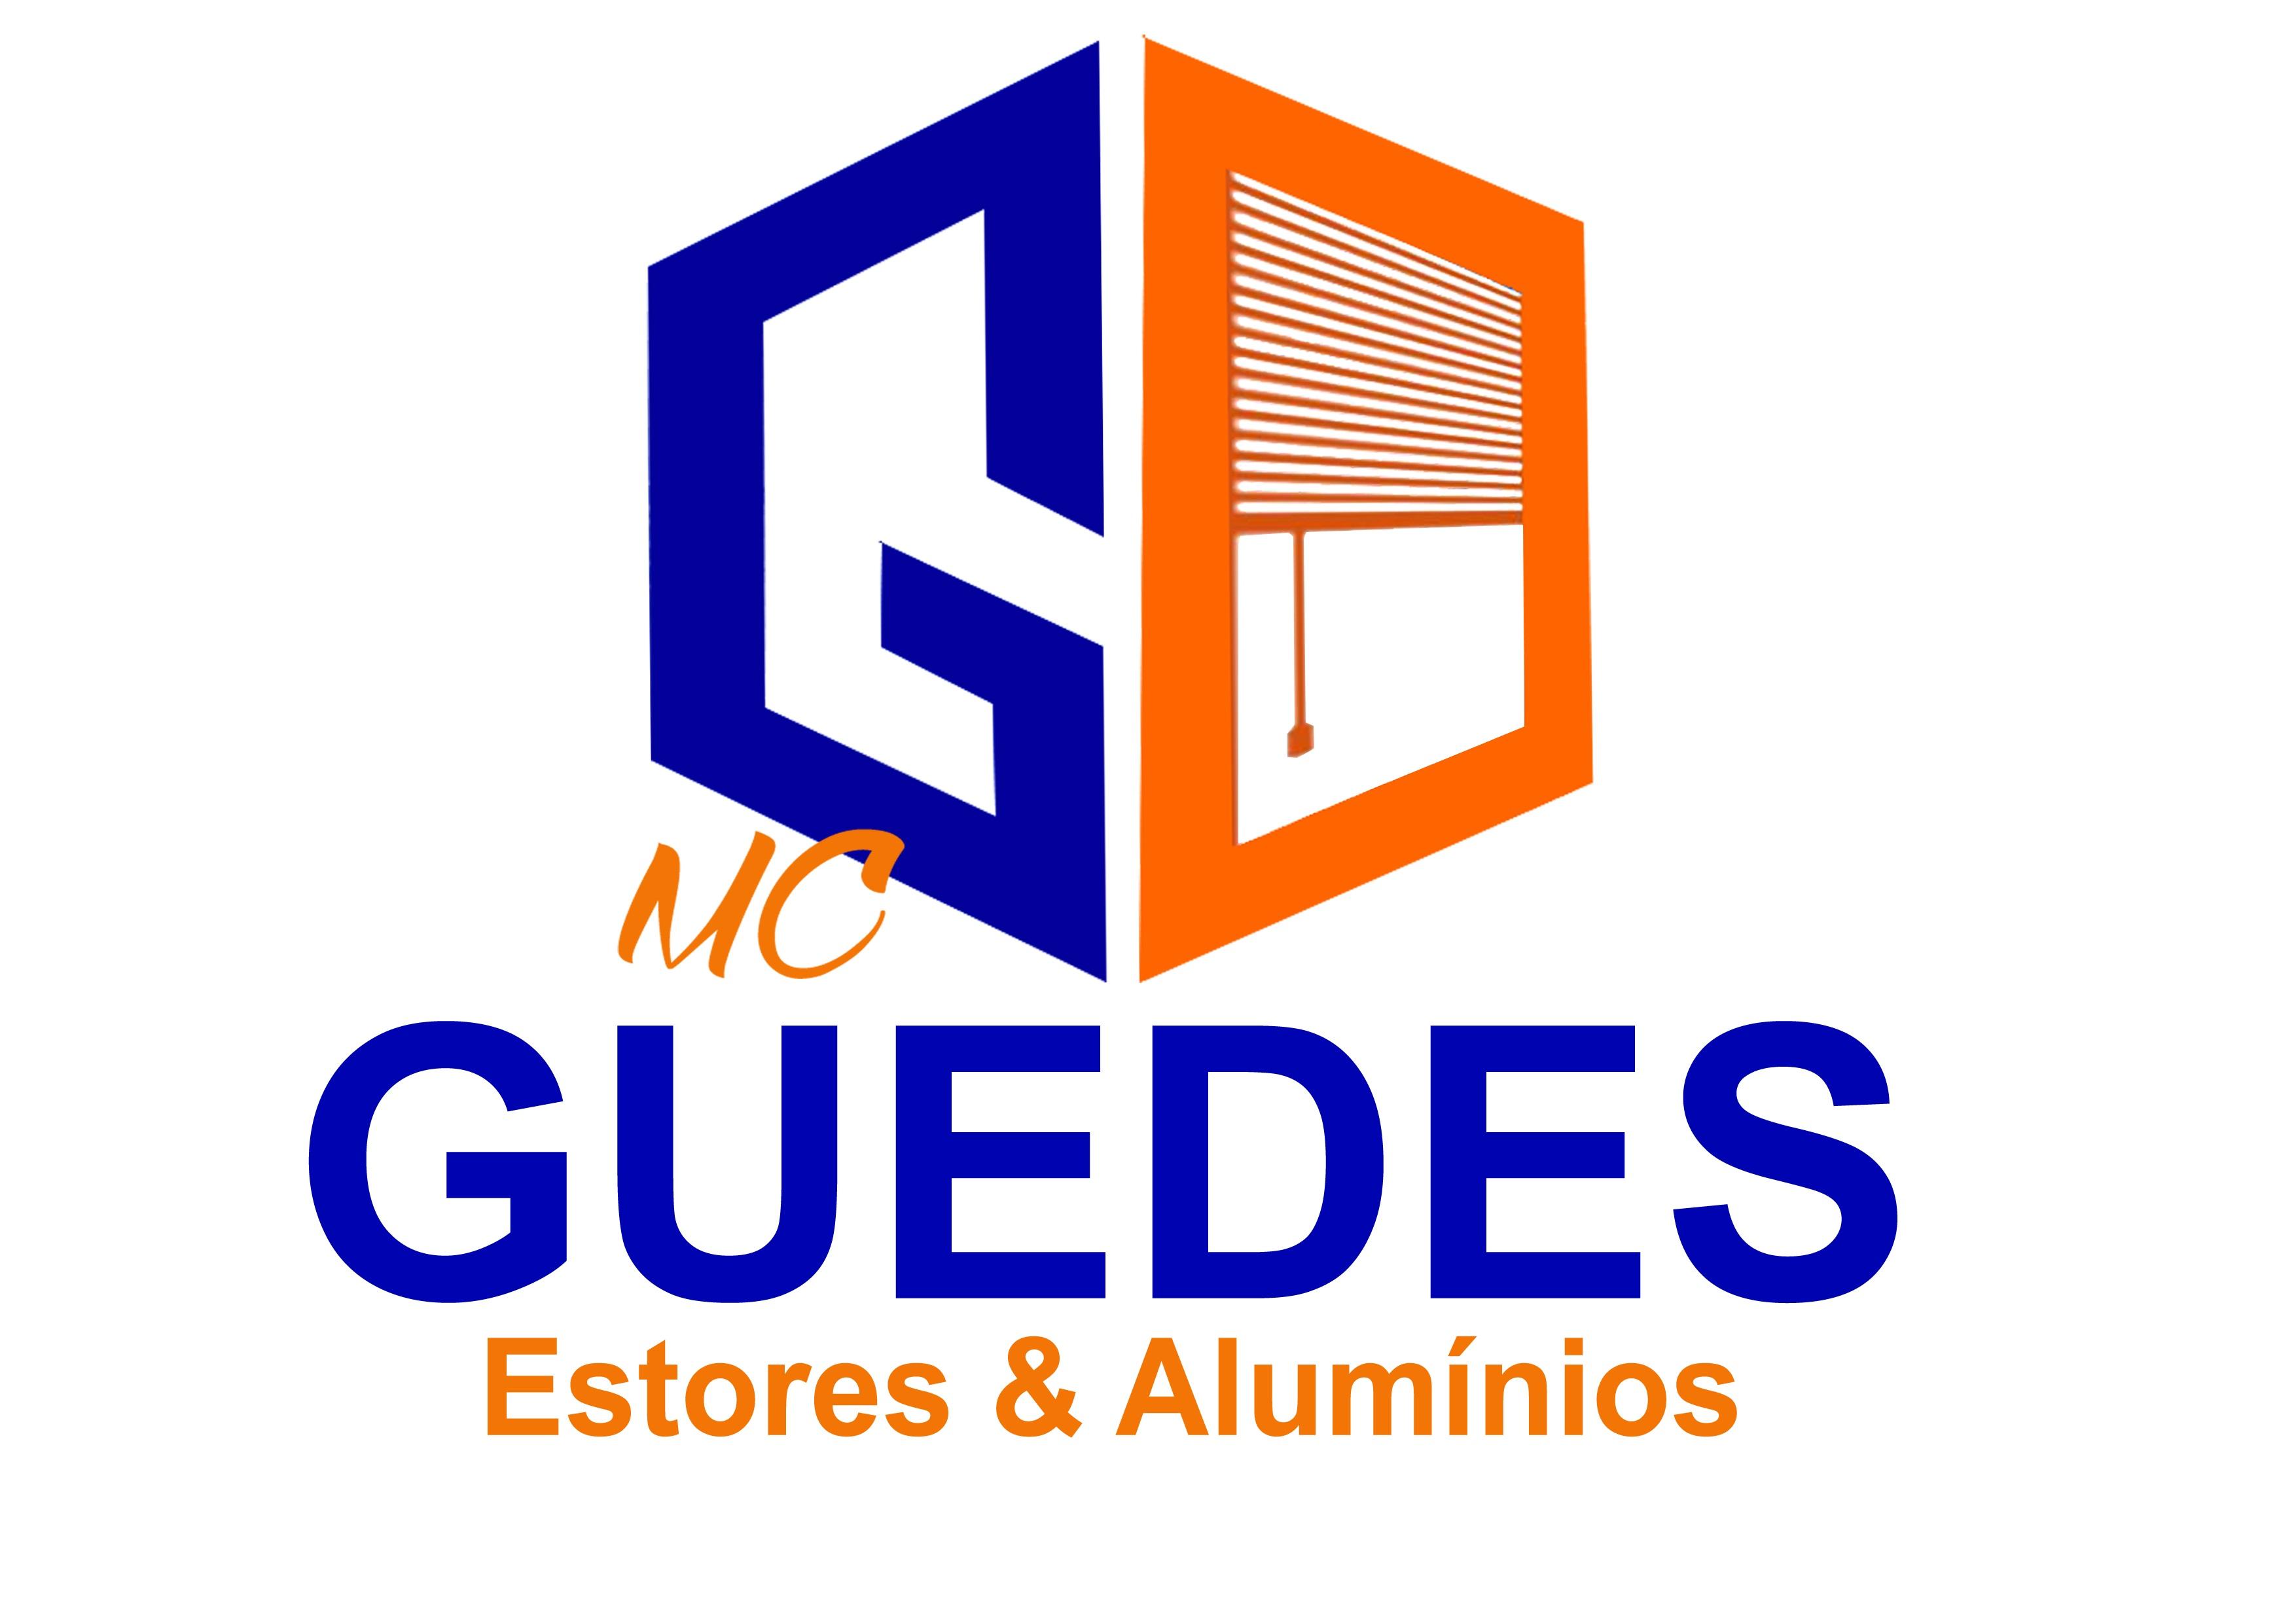 Mcguedes - Estores E Alumínios Lda